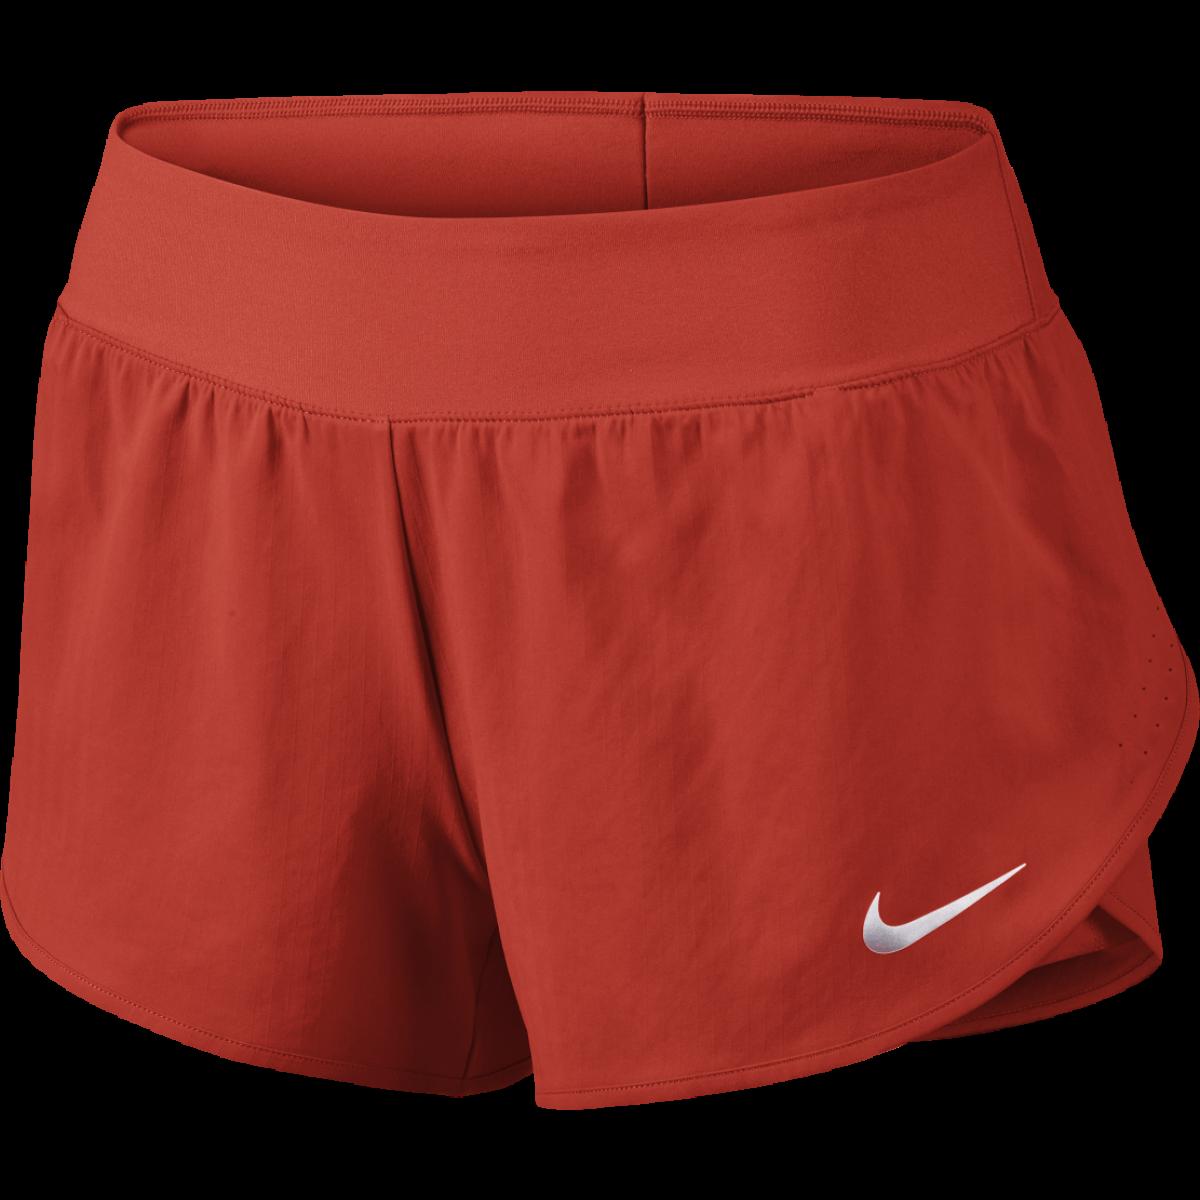 Nike ace women s. Short clipart sport shorts